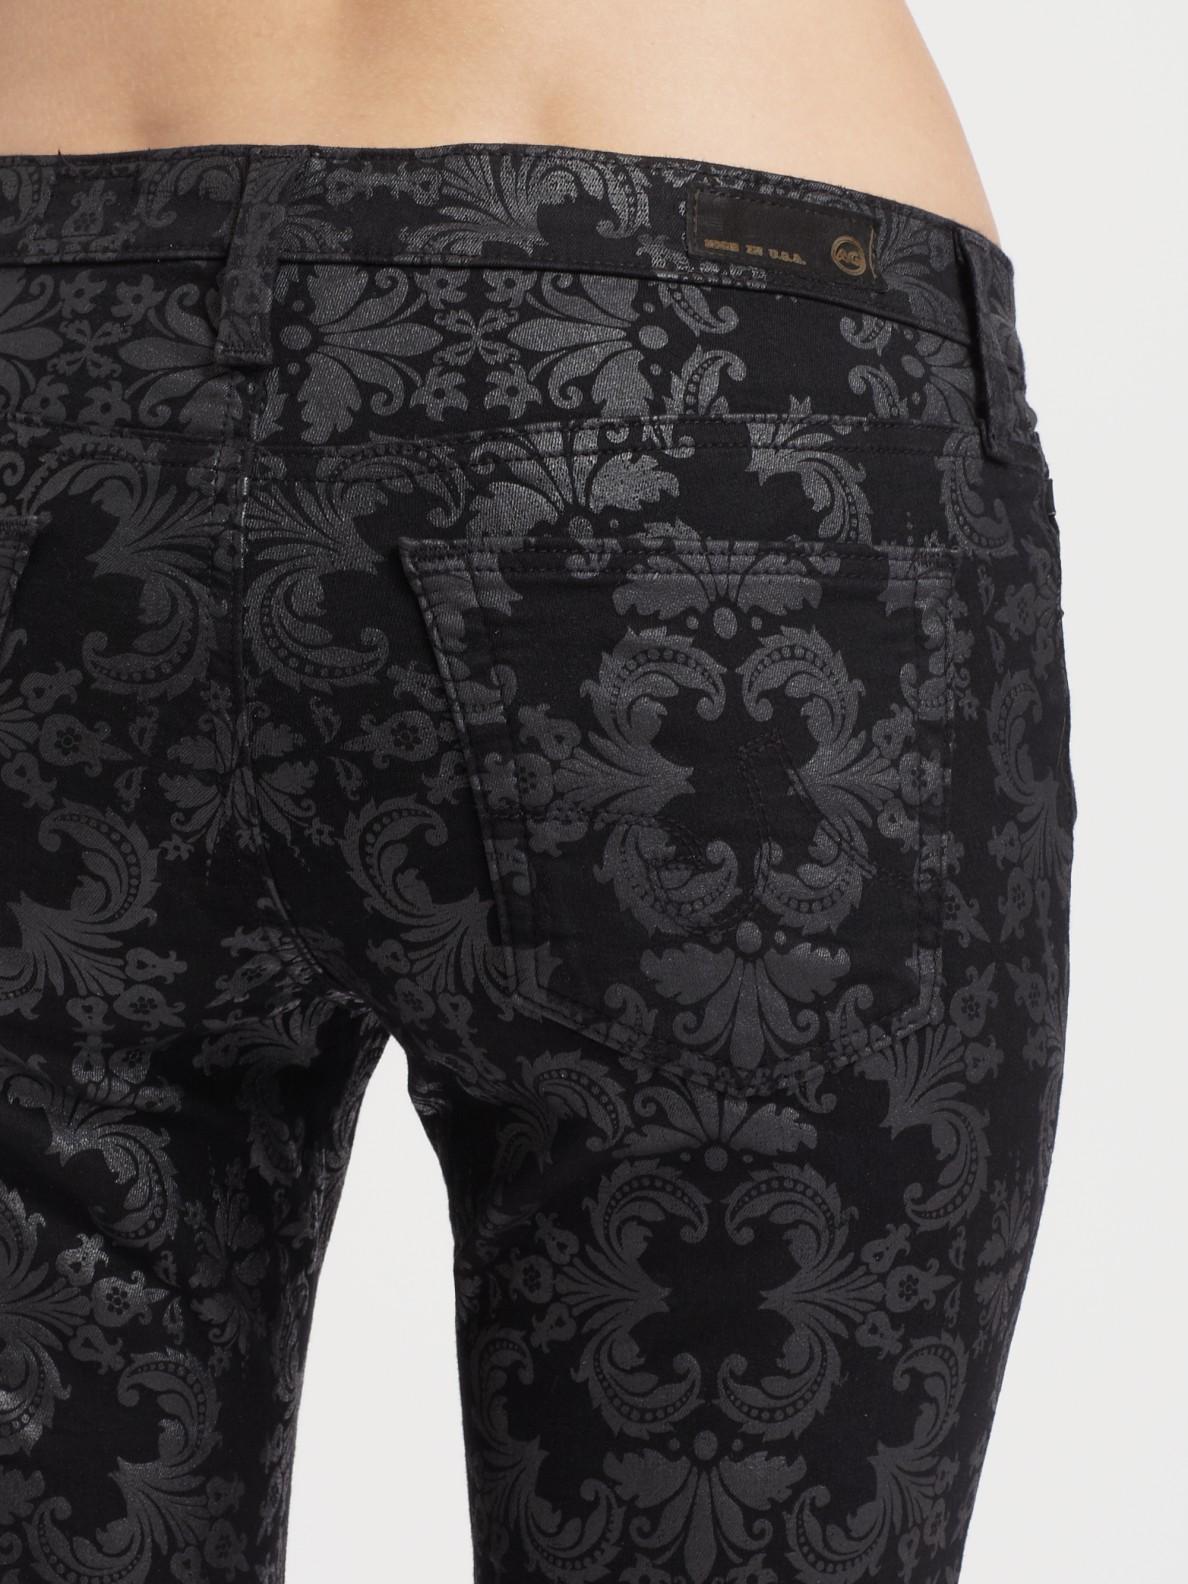 Black Printed Jeans | Ku Jeans